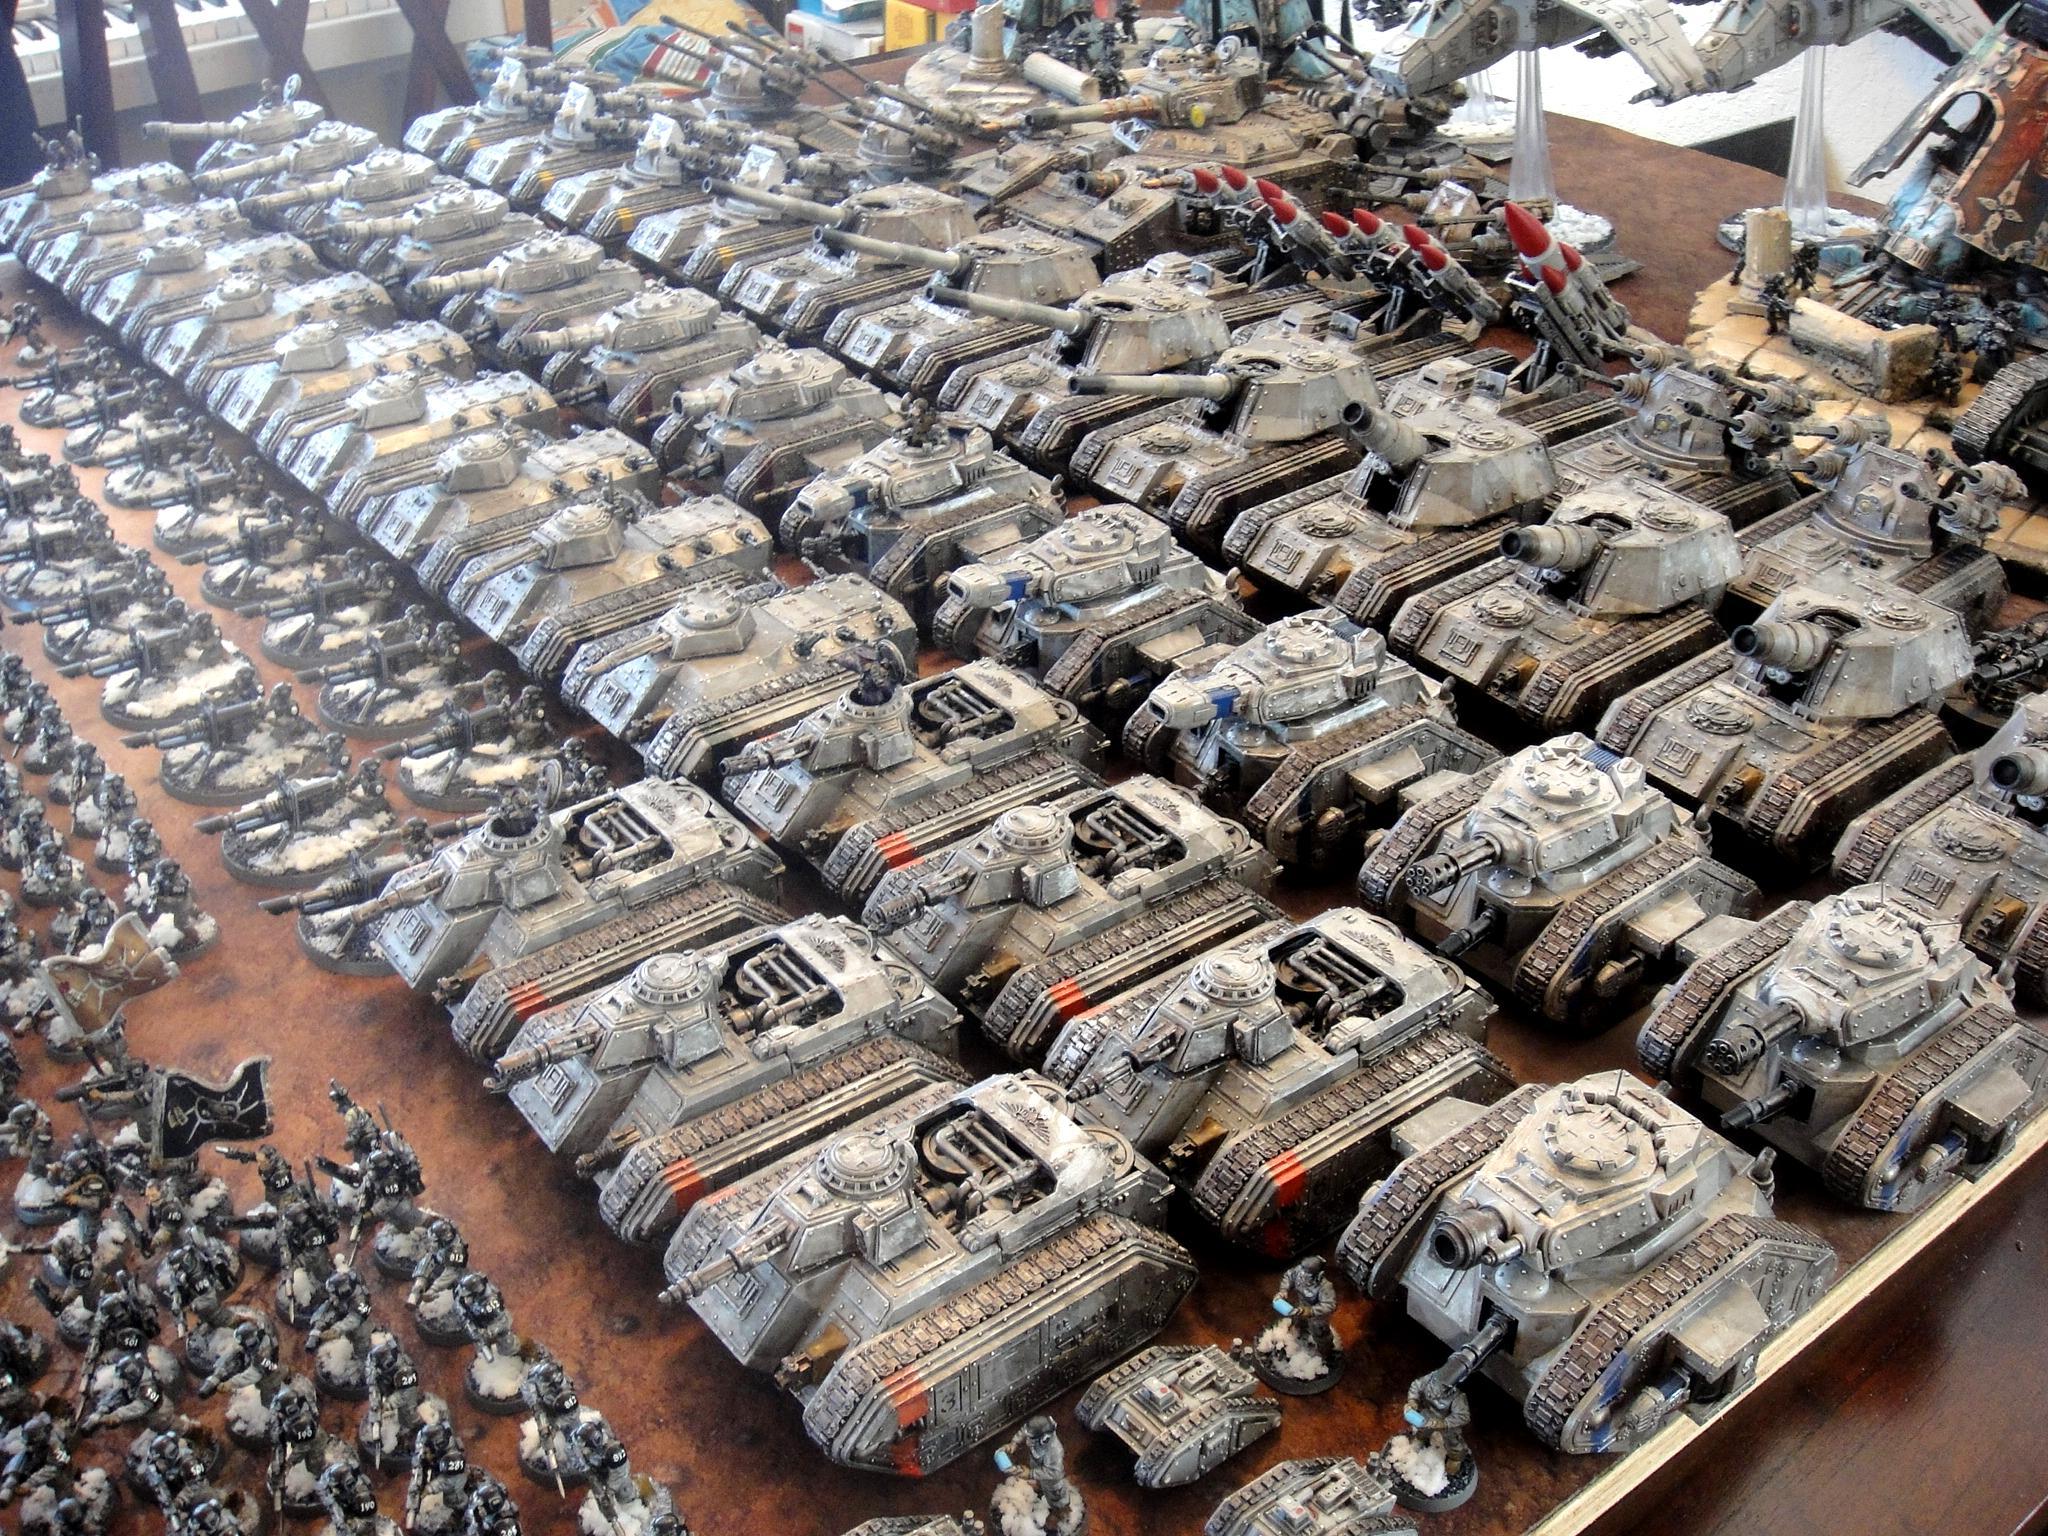 Astra Militarum, Imperial Guard, Infantry, Titan, Vehicle